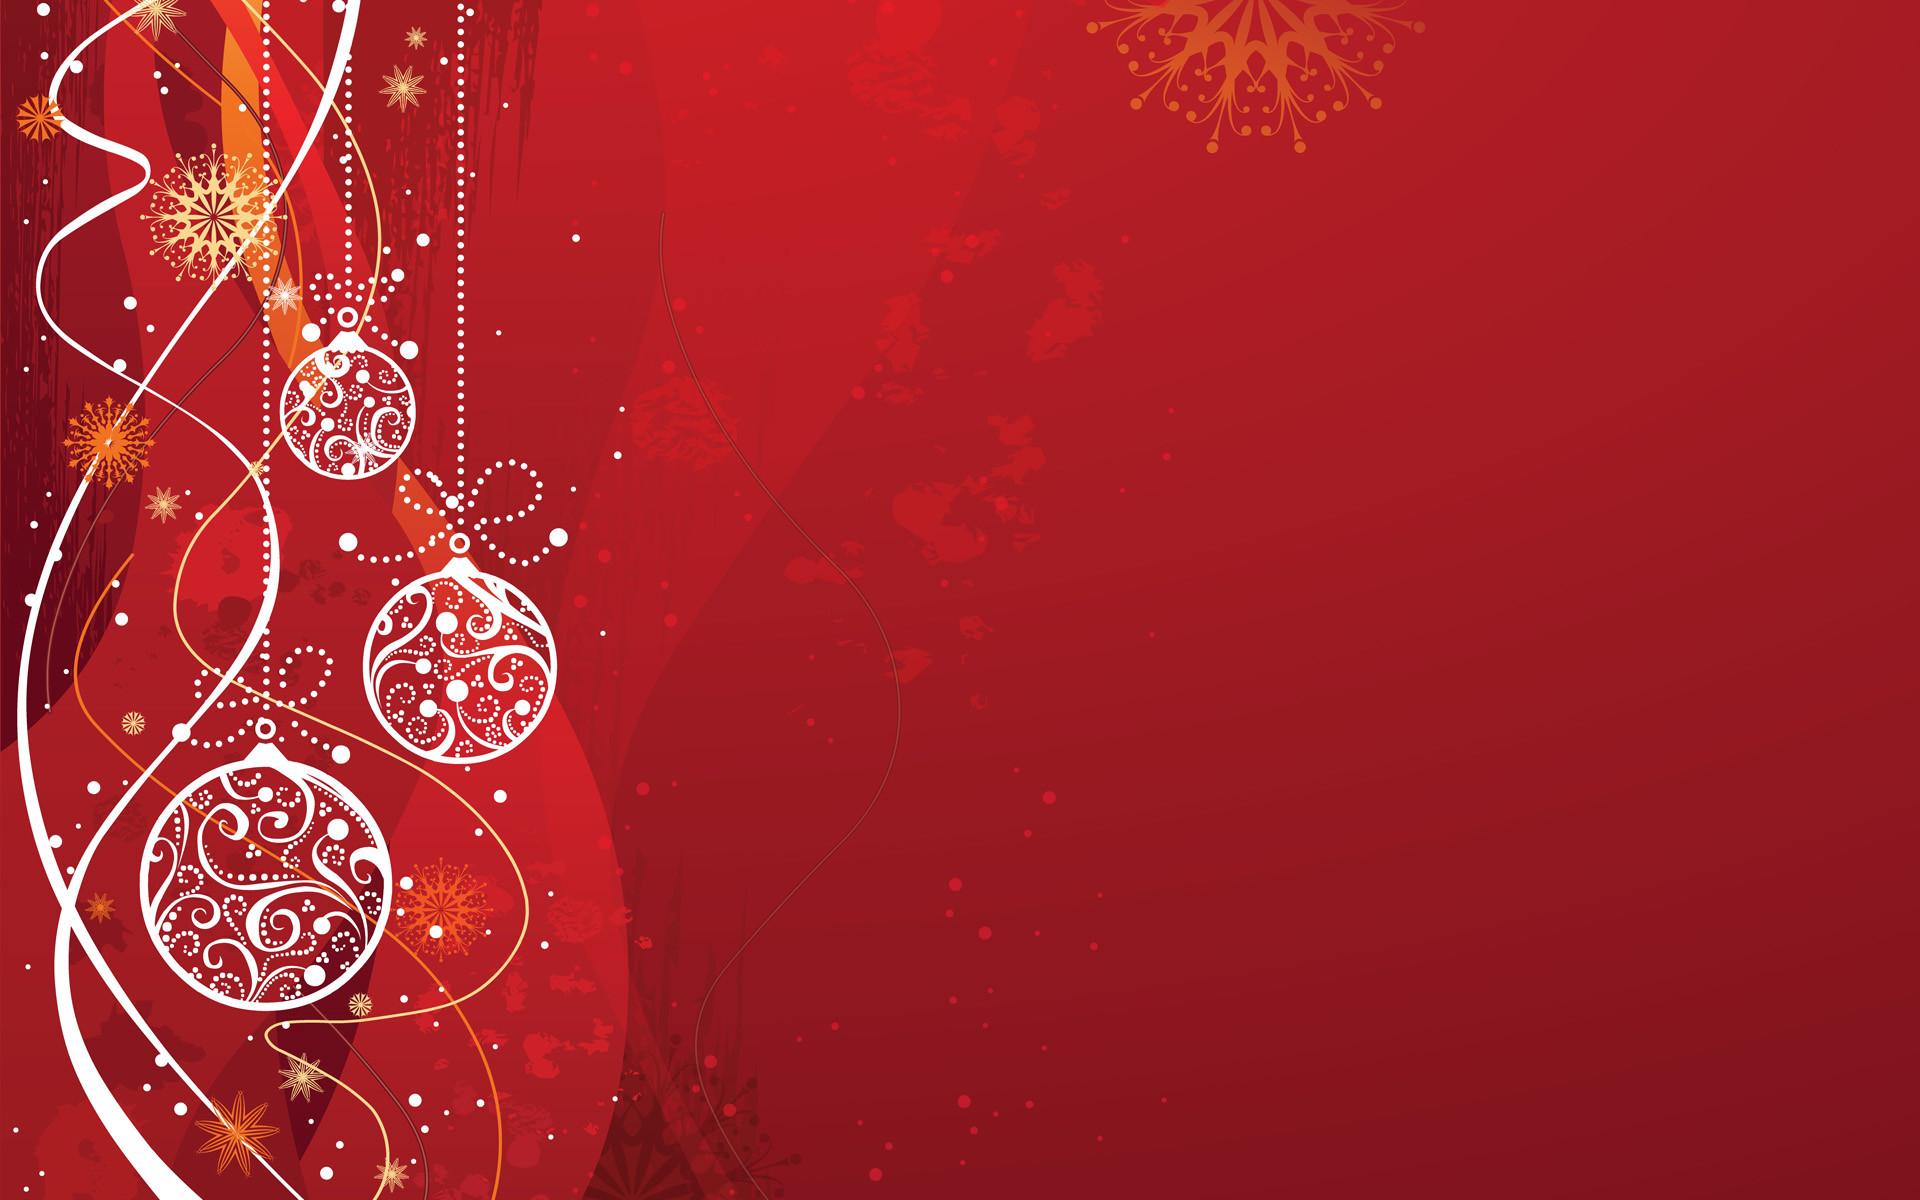 Natale sfondi 52 immagini for Sfondi natalizi 1920x1080